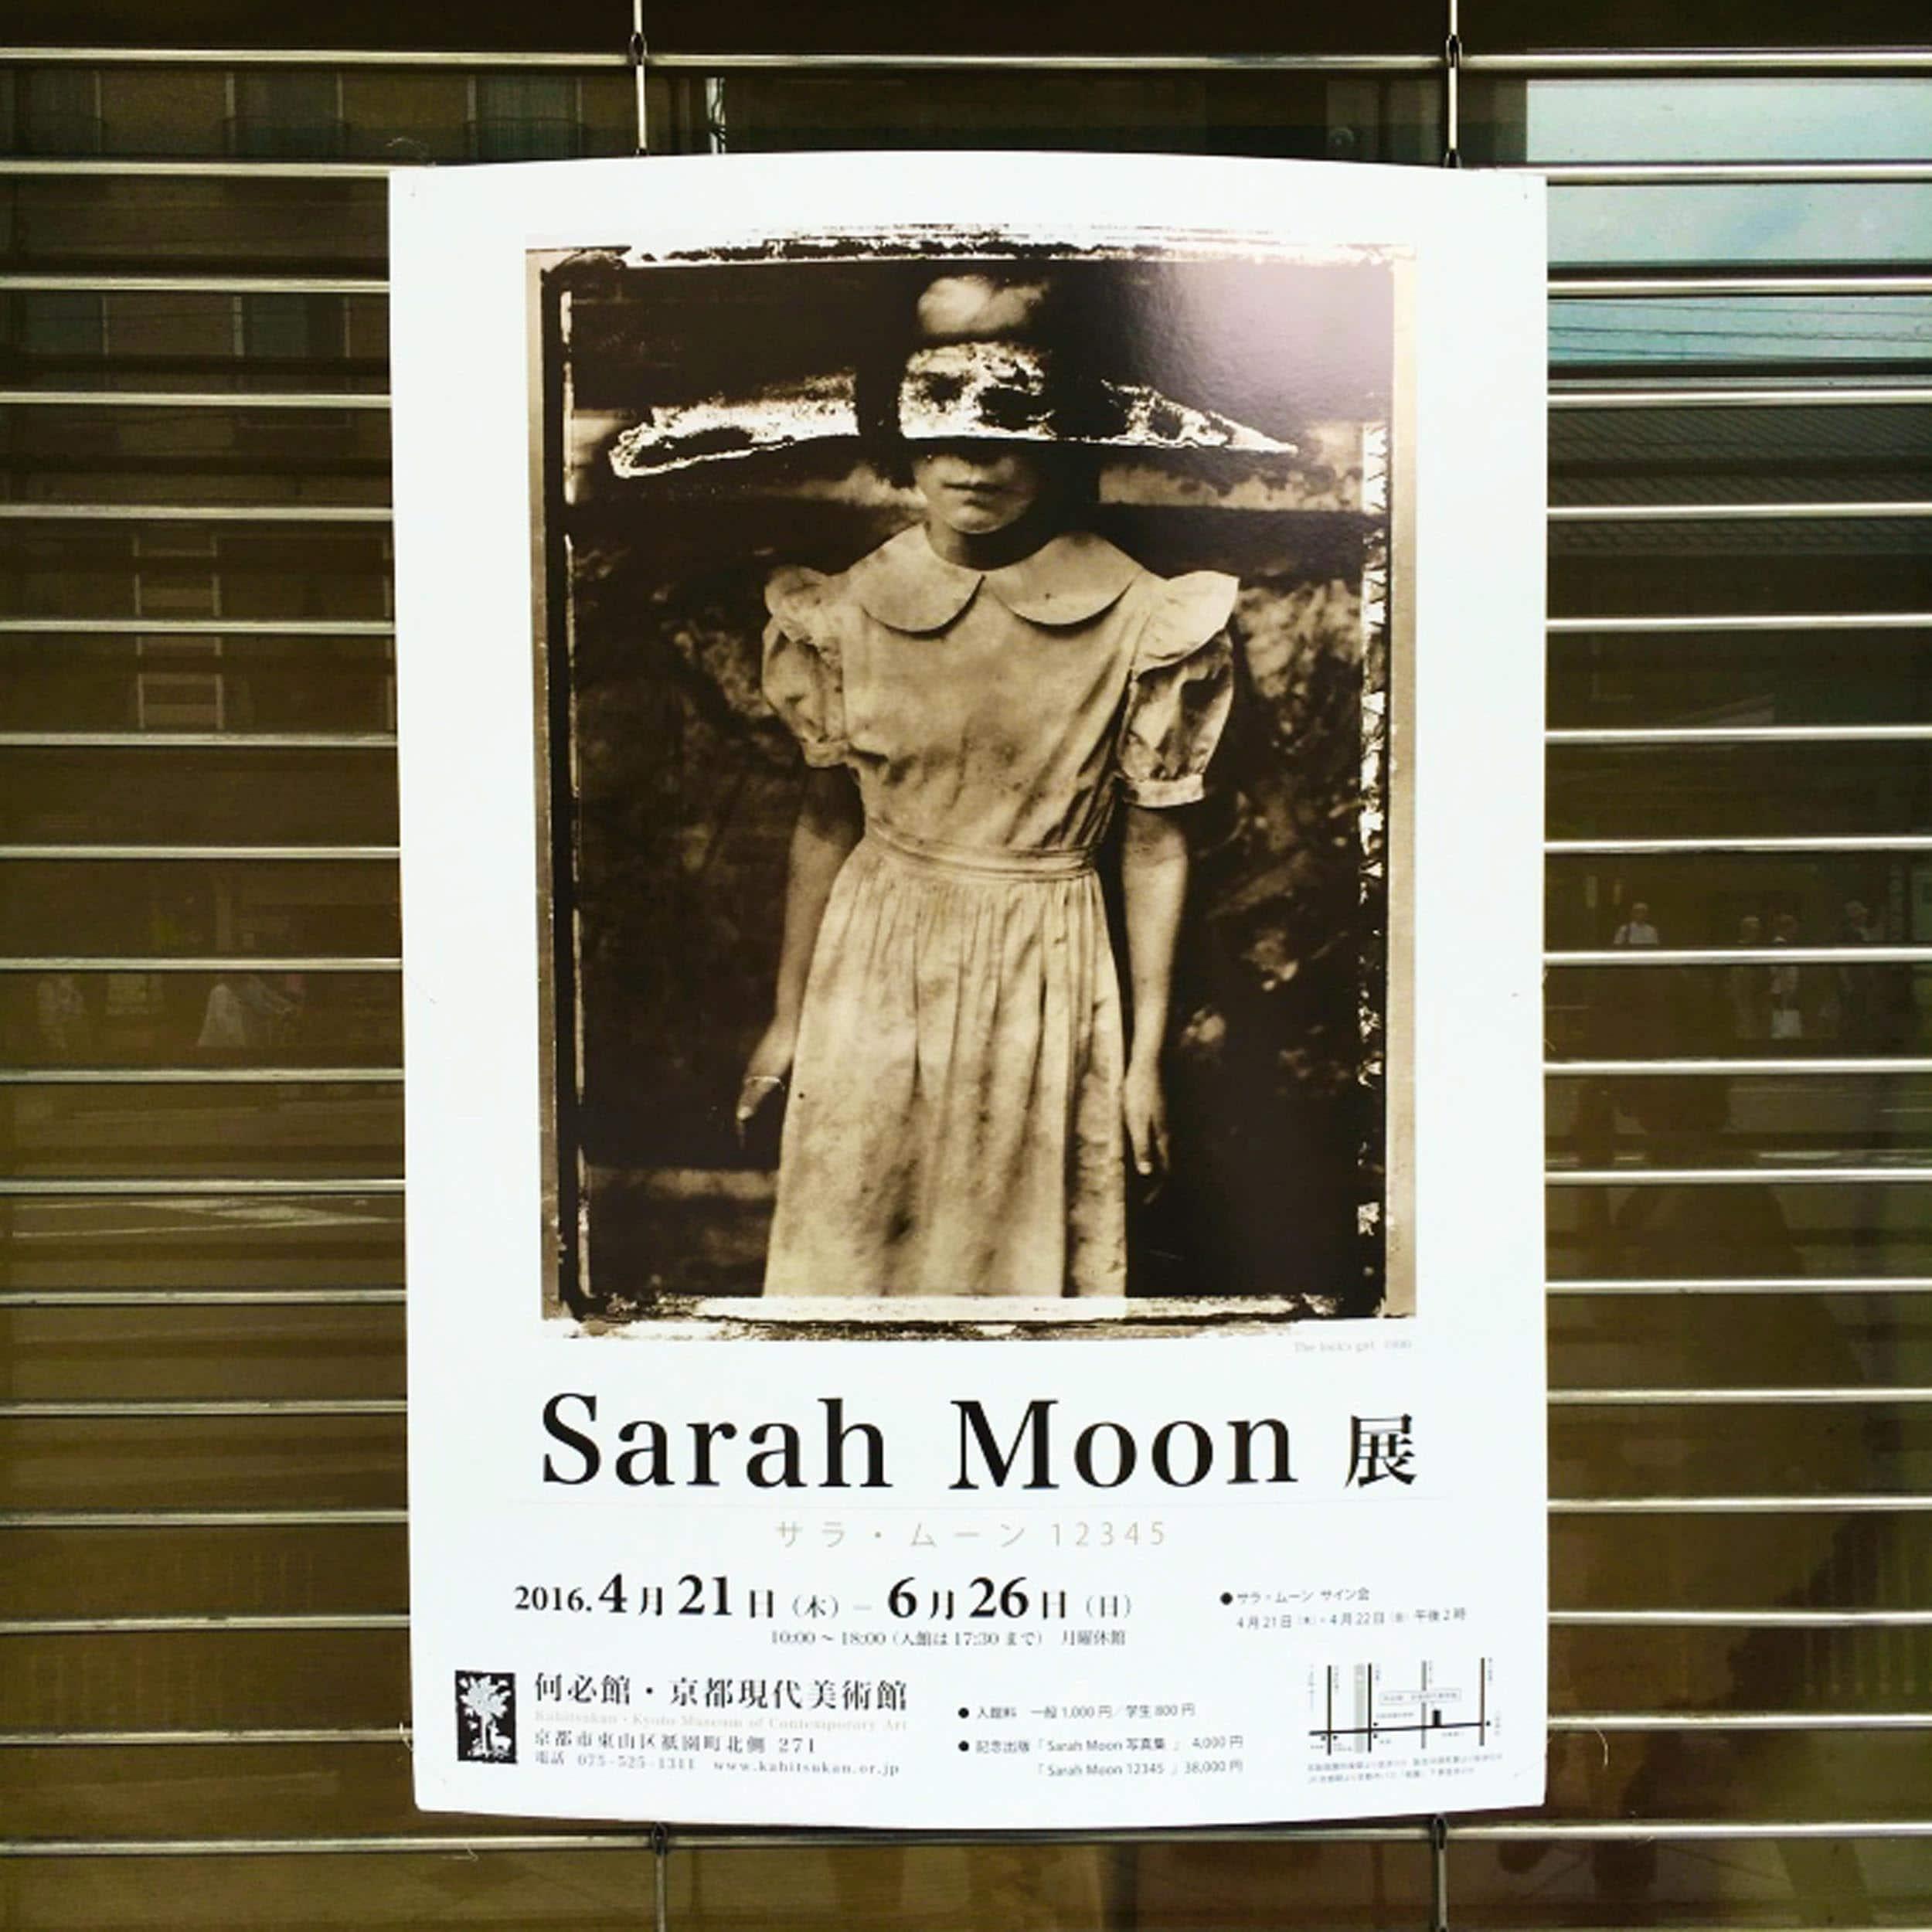 #SARAH MOON / KYOTO / JAPAN / 2016